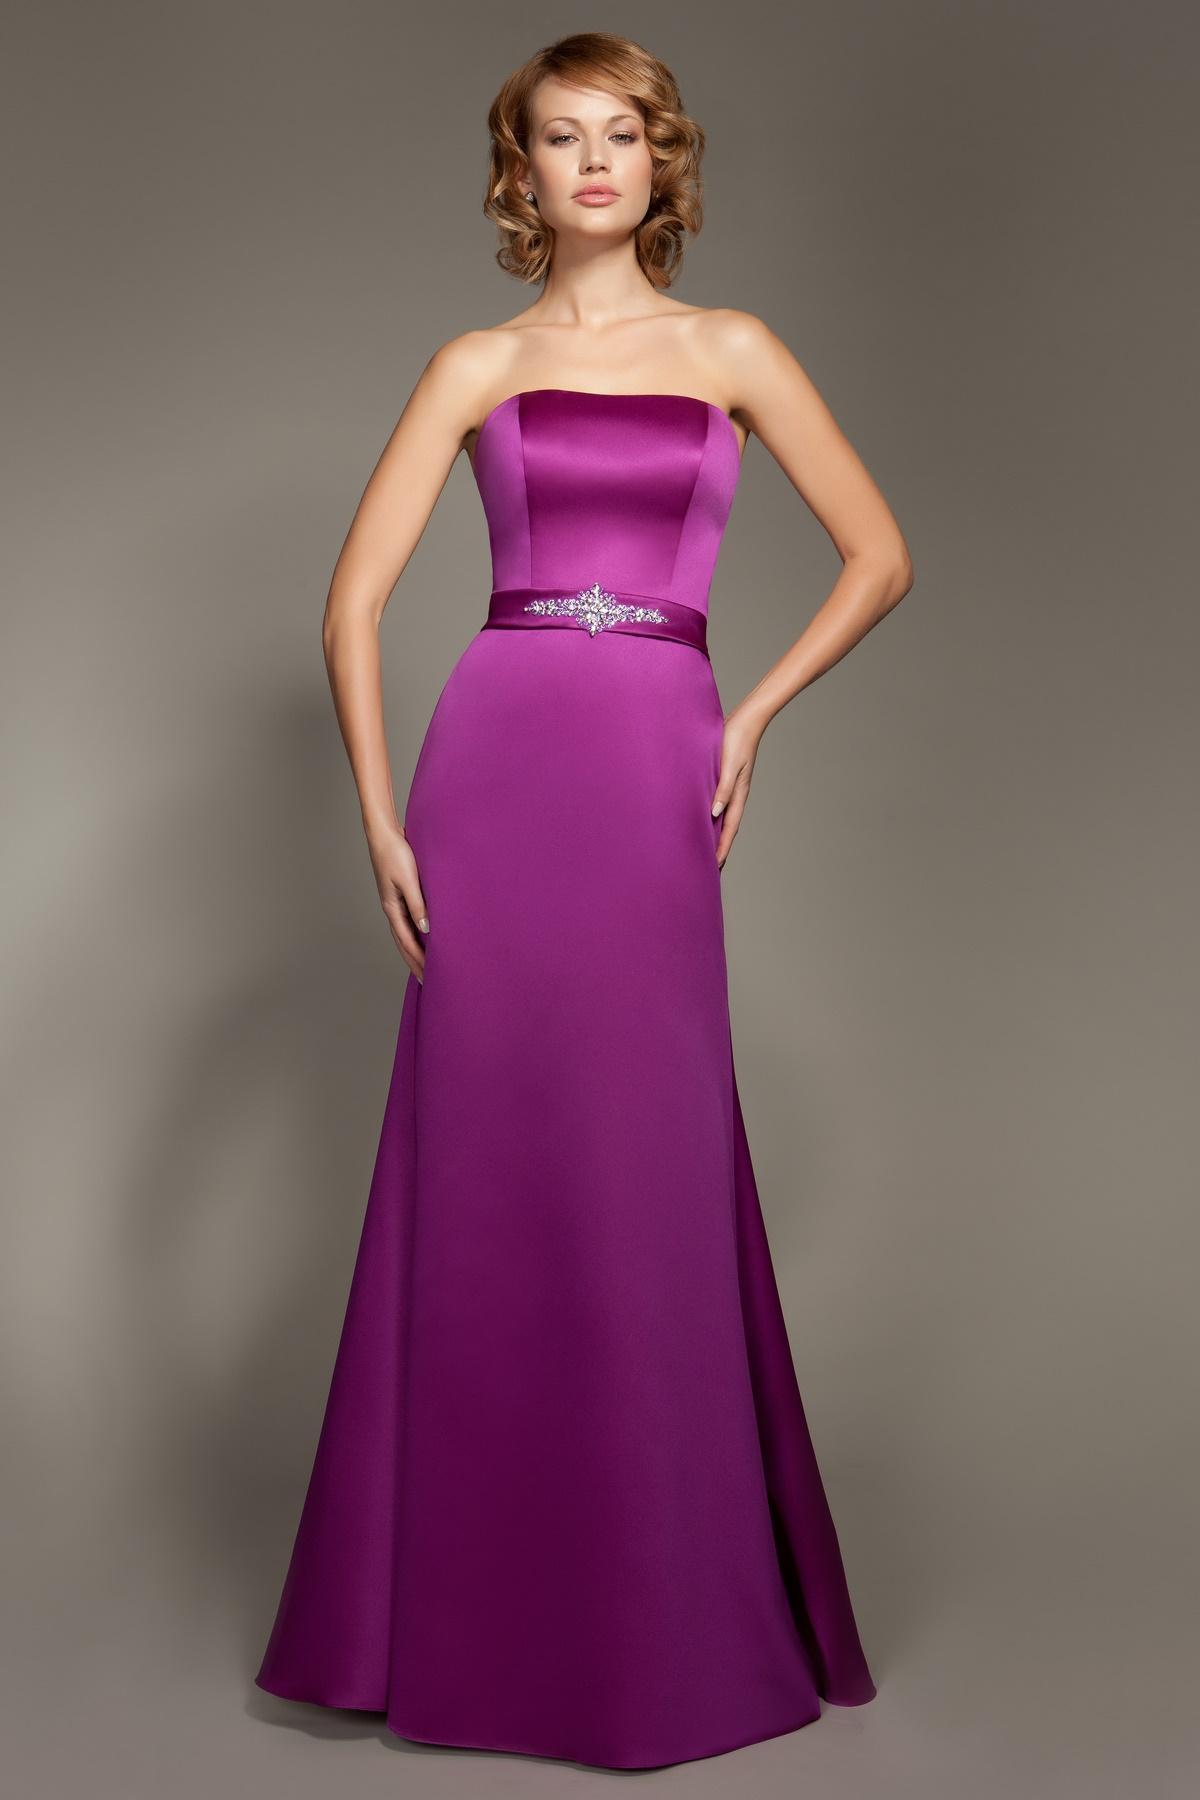 2015 bridesmaid dresses cheap christmas dresses sheath strapless full